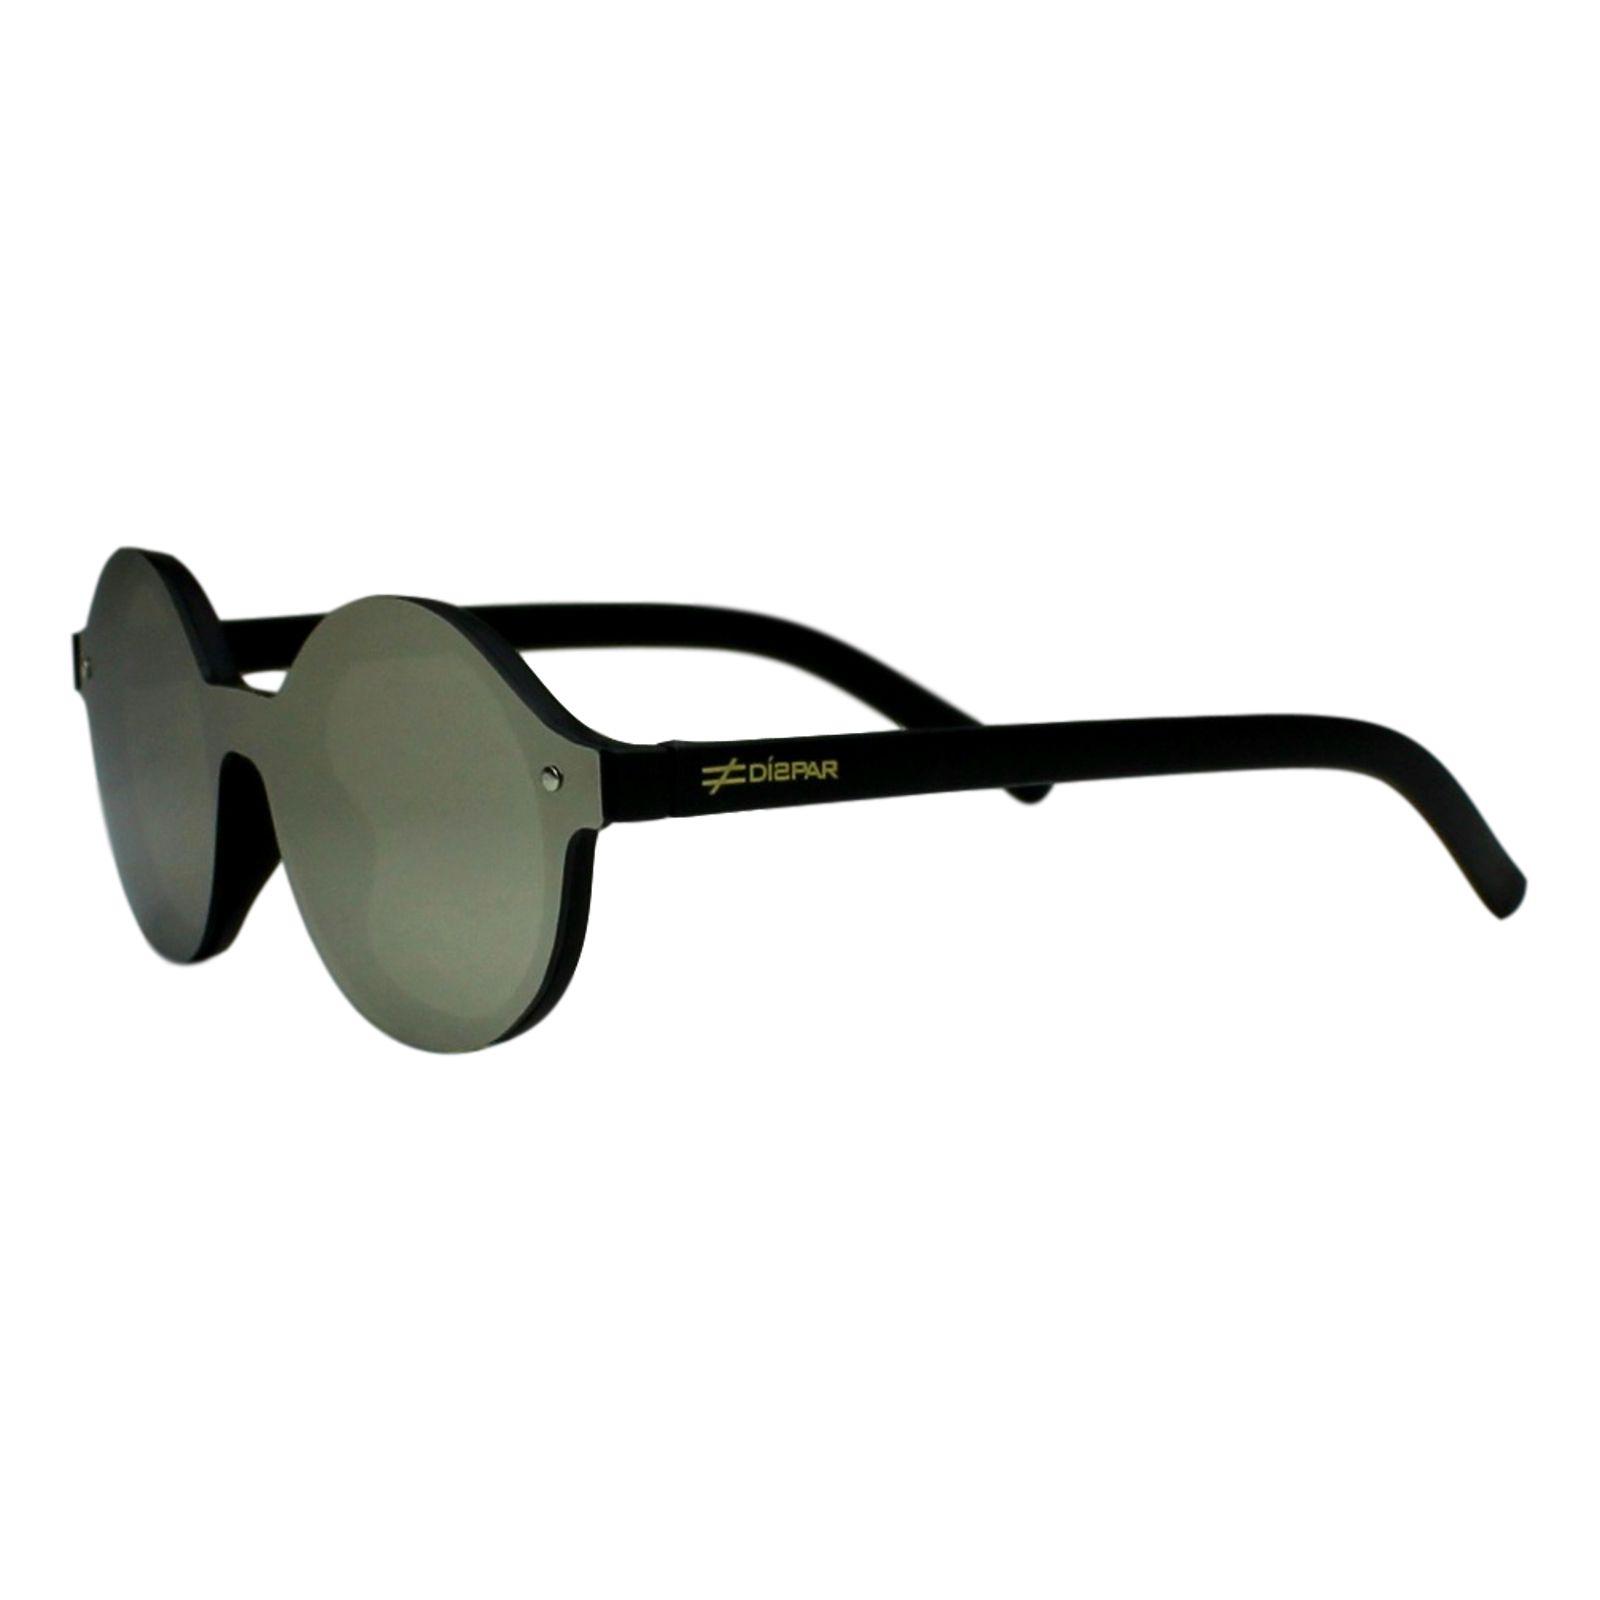 Óculos de Sol Díspar ID1898 infantil idade 6 a 9 anos Prata - Díspar Style  ... 603304bb42